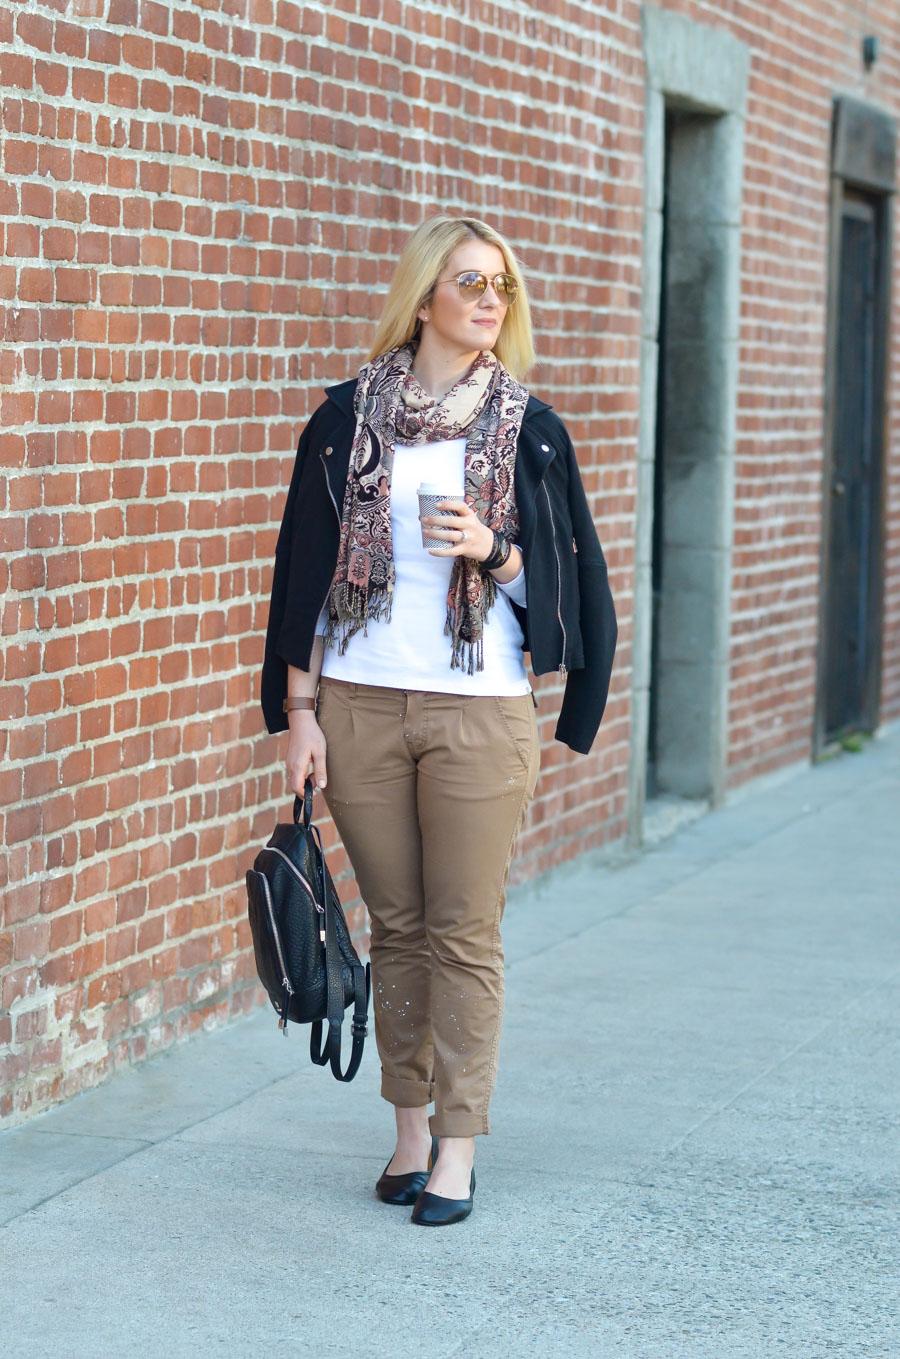 Women's Khaki Pants Outfit for Spring w. Black Flats